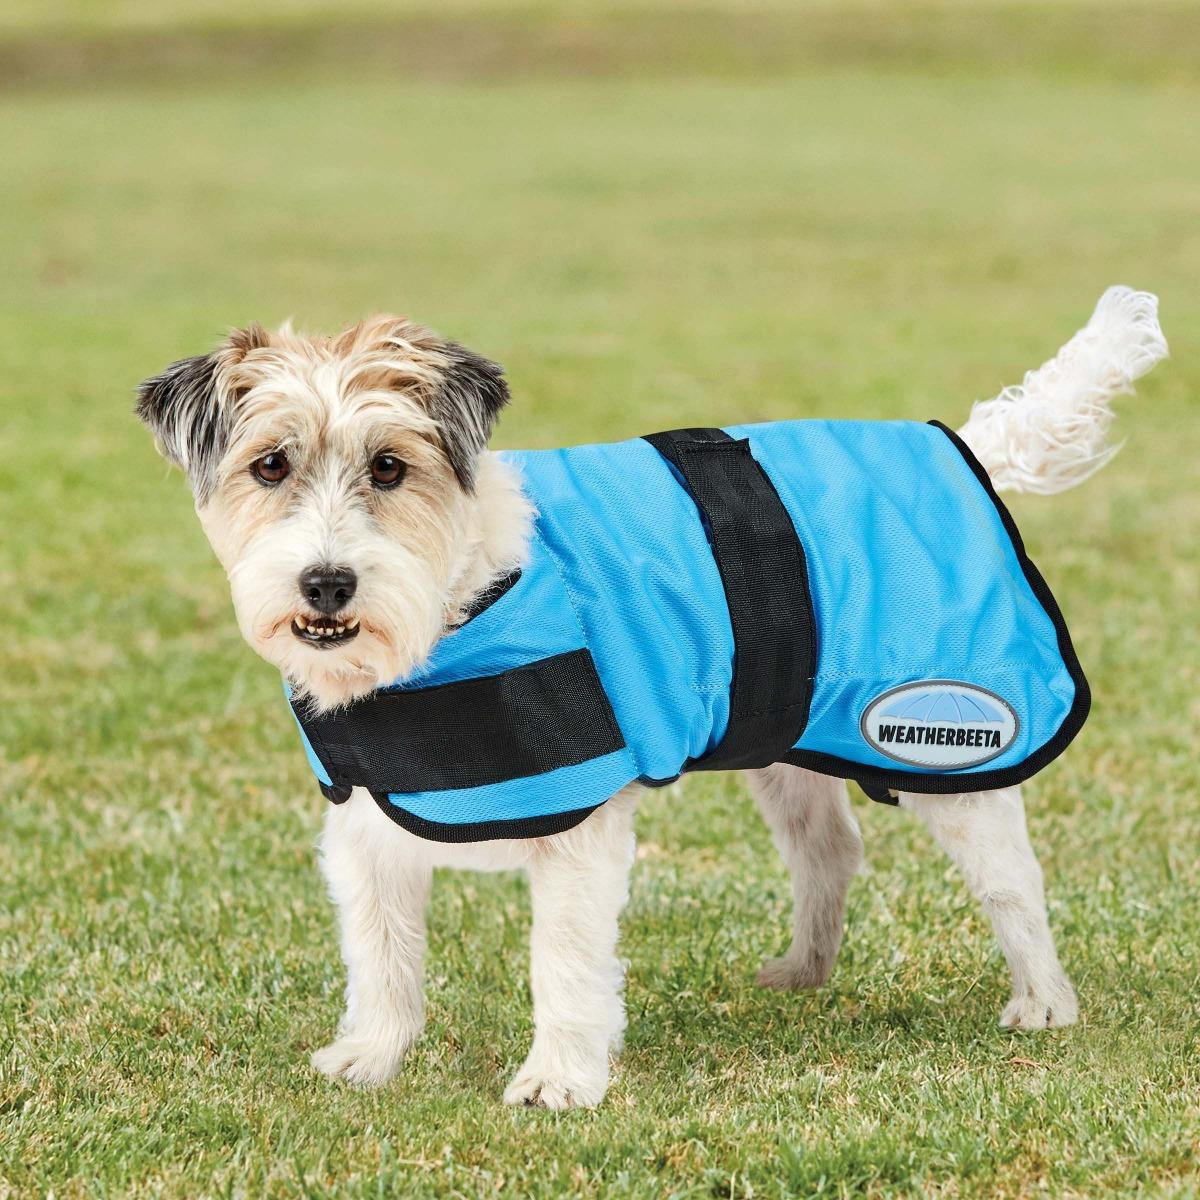 weatherbeeta therapy tec cooling coat